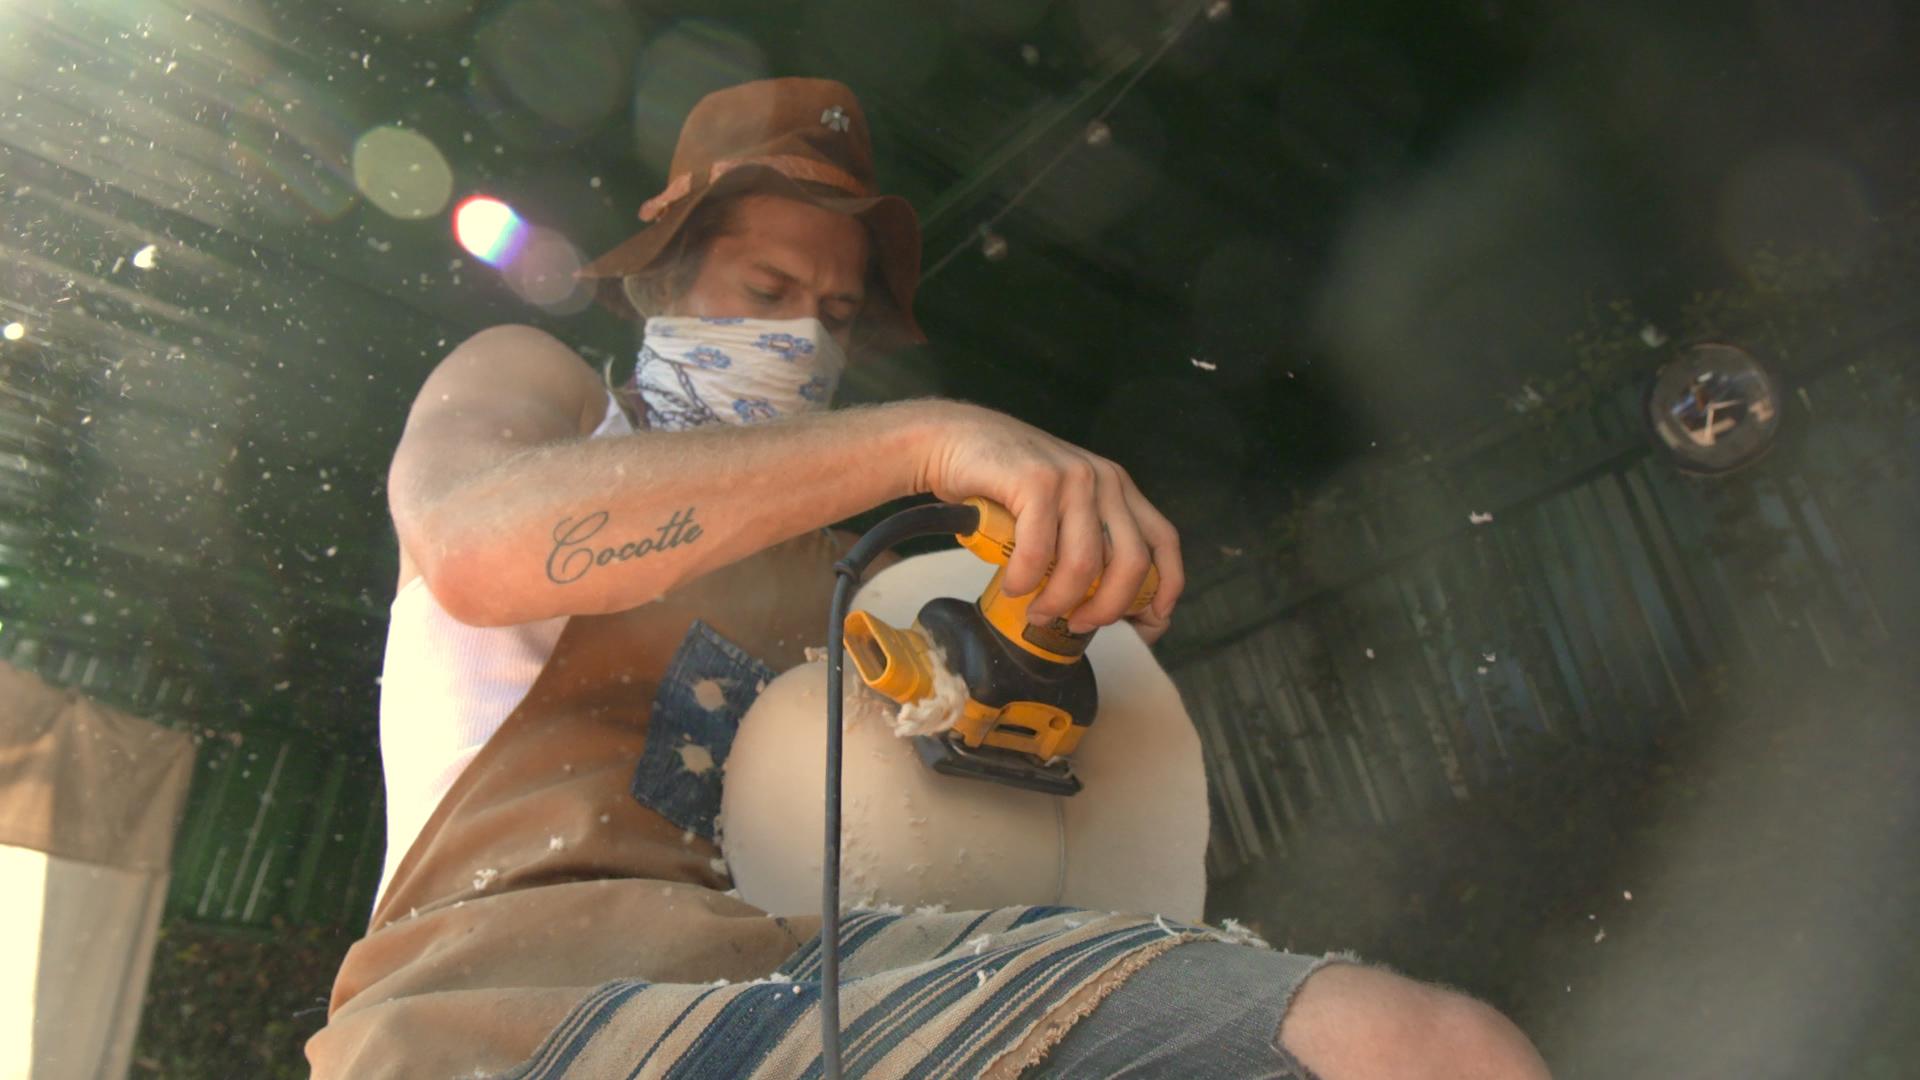 Nick Fouquet uses an electric sander to shape a felt hat. 7fc037a6db04